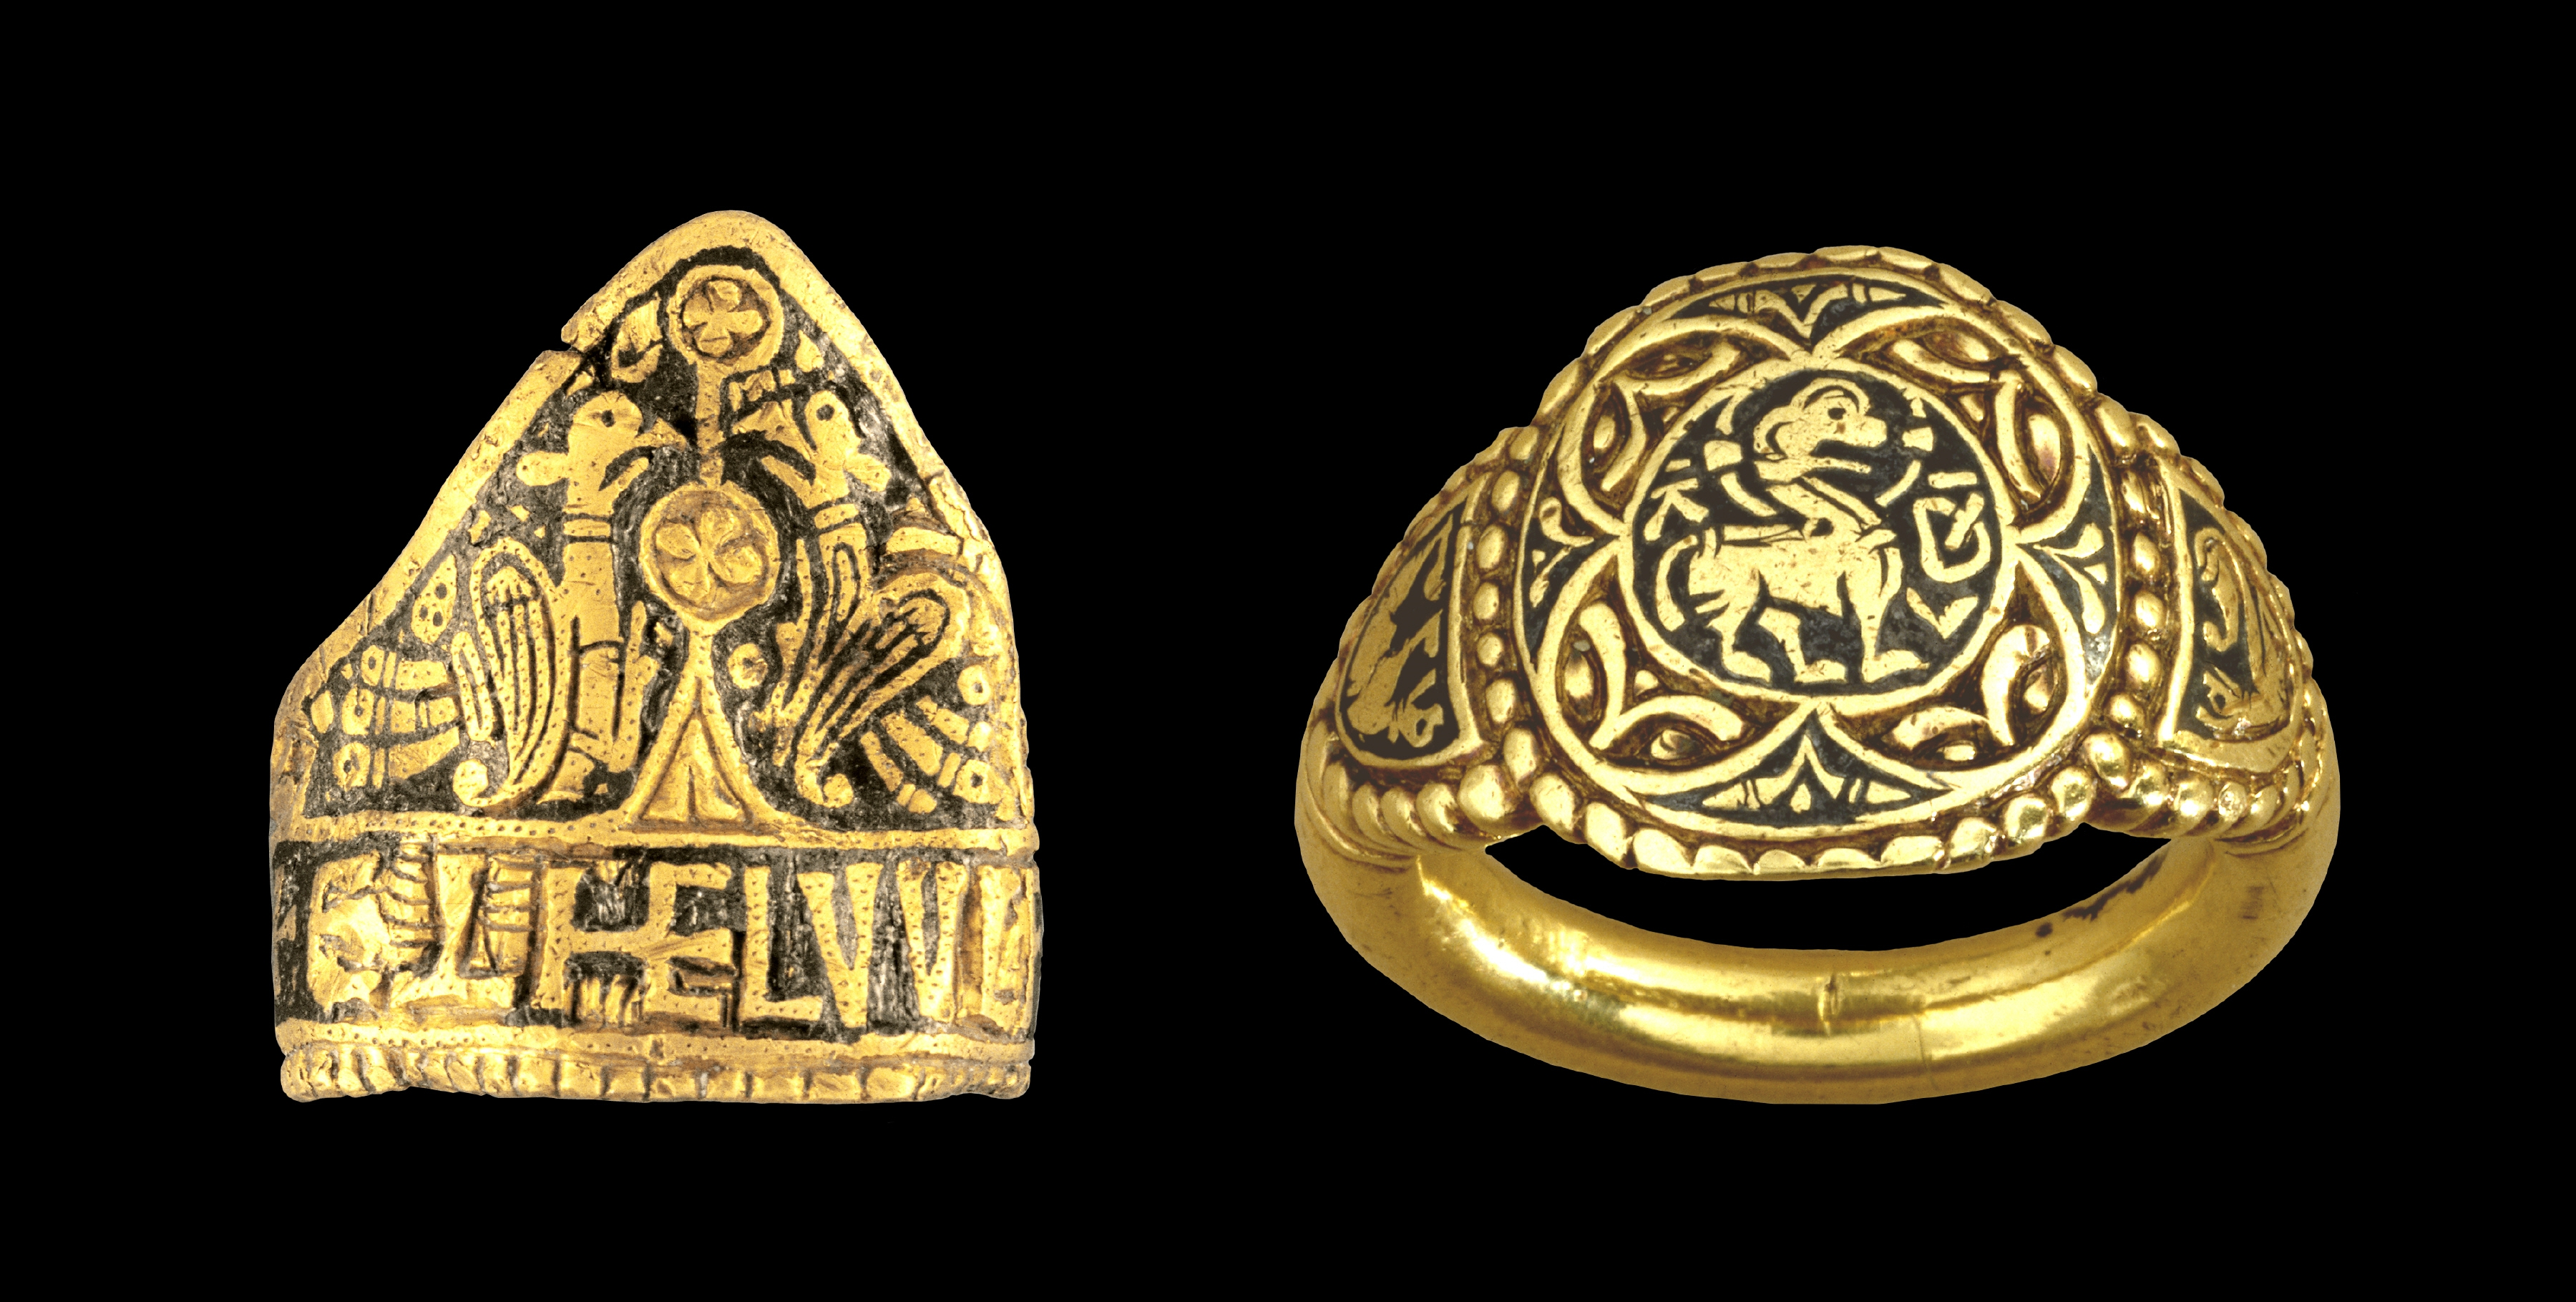 Rings In The British Museum